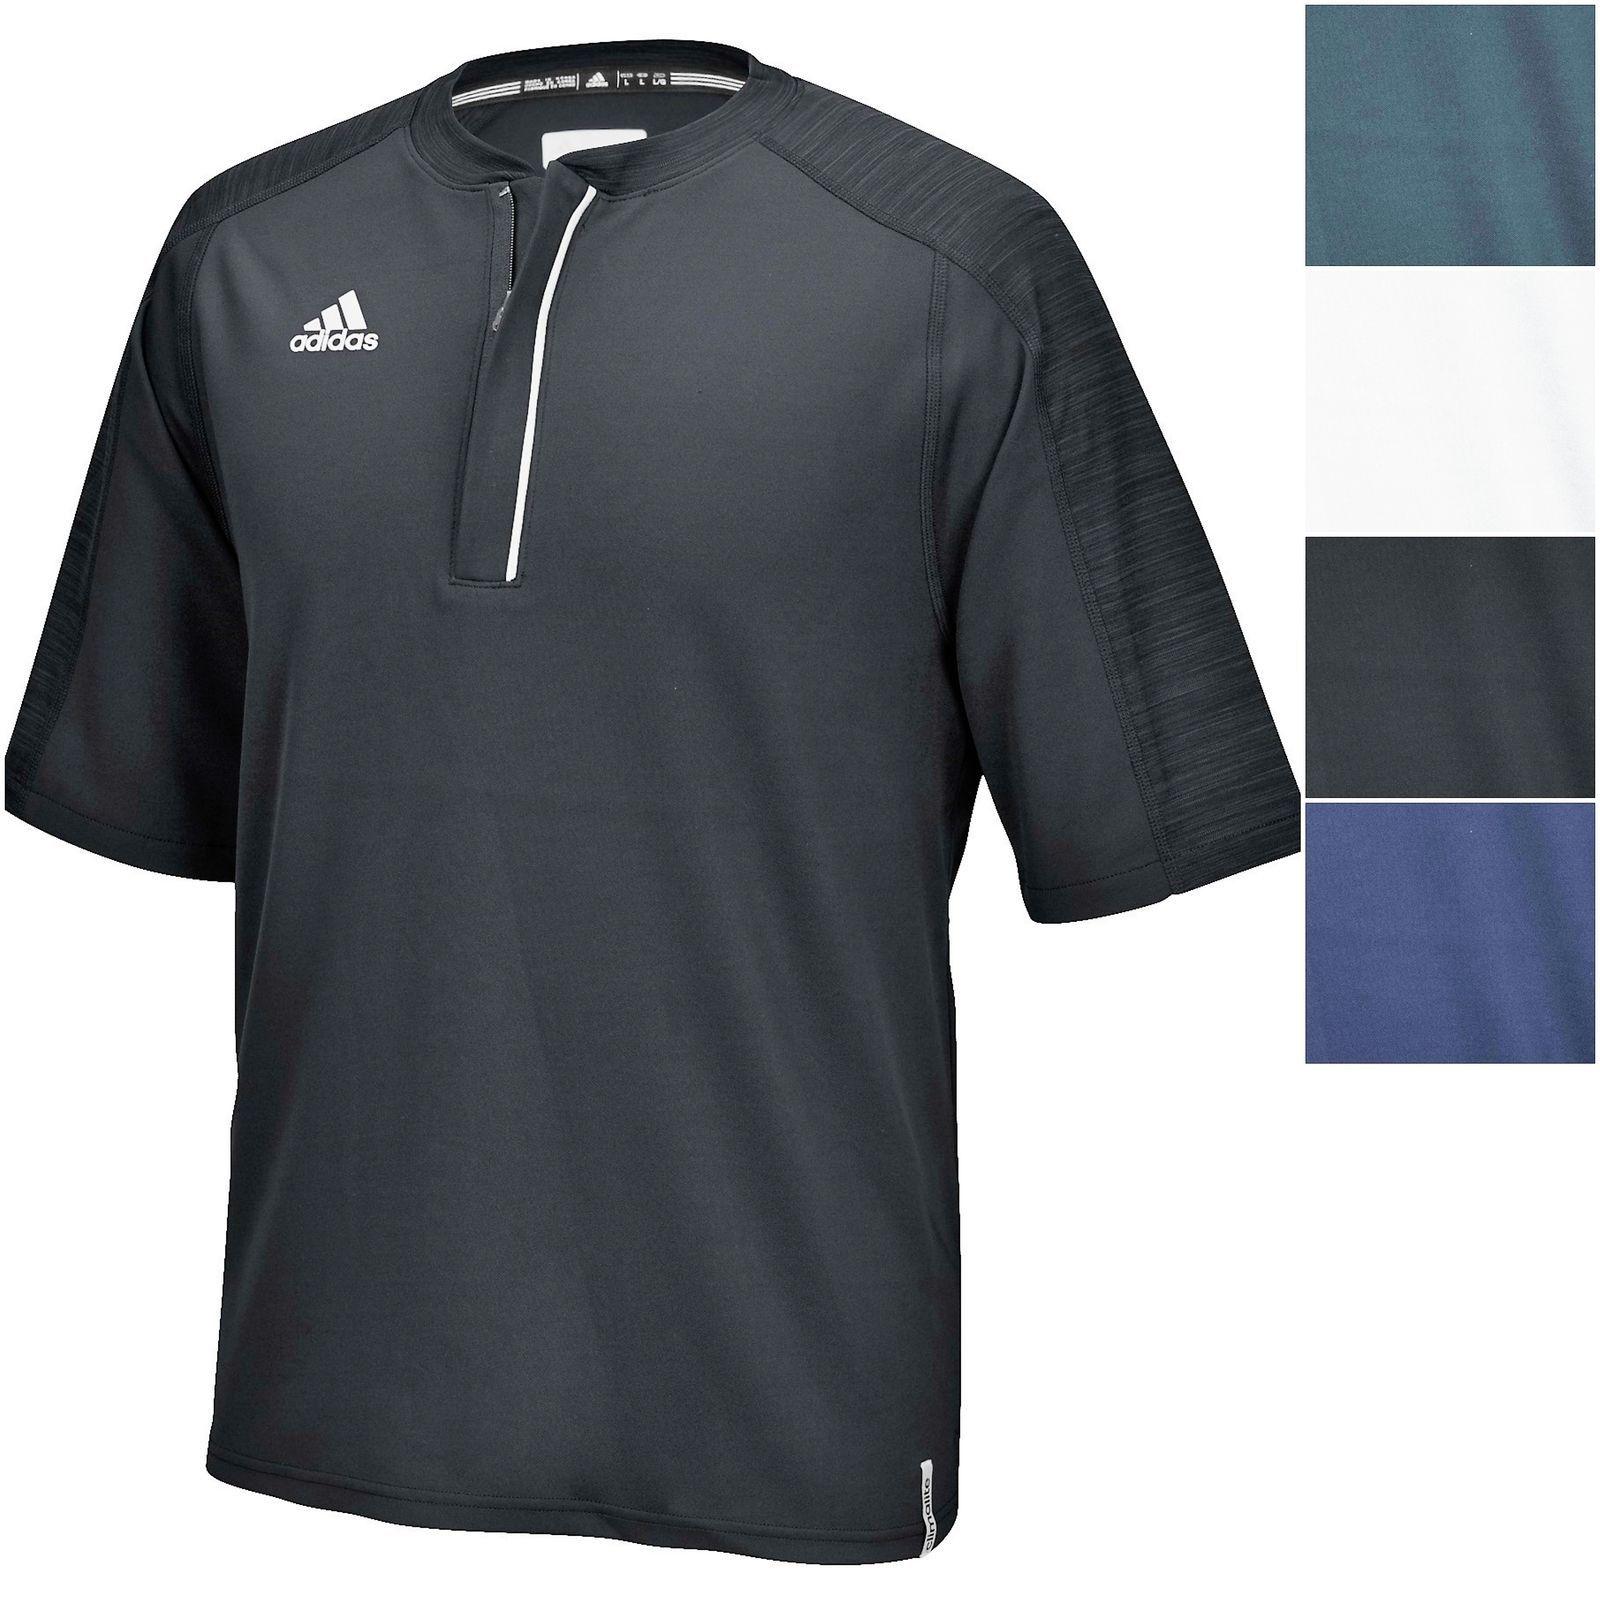 Adidas pour homme Climalite moderne Varsity complète Bouton Polo, Homme, bleu marine